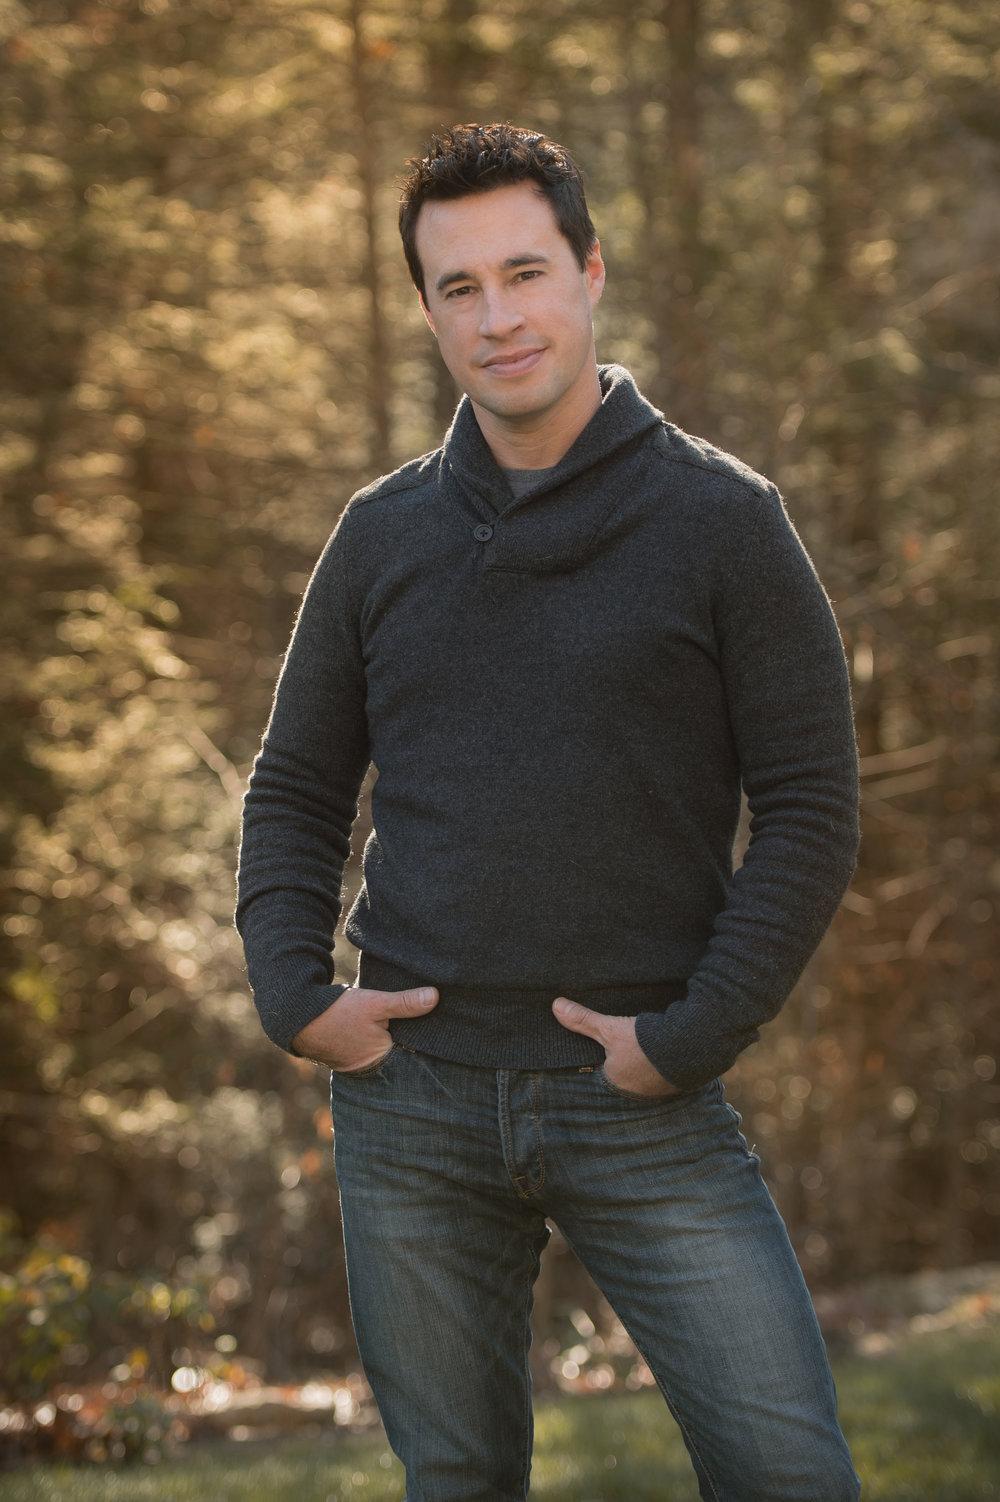 Bryan Avigne - Owner & Principal Photographer